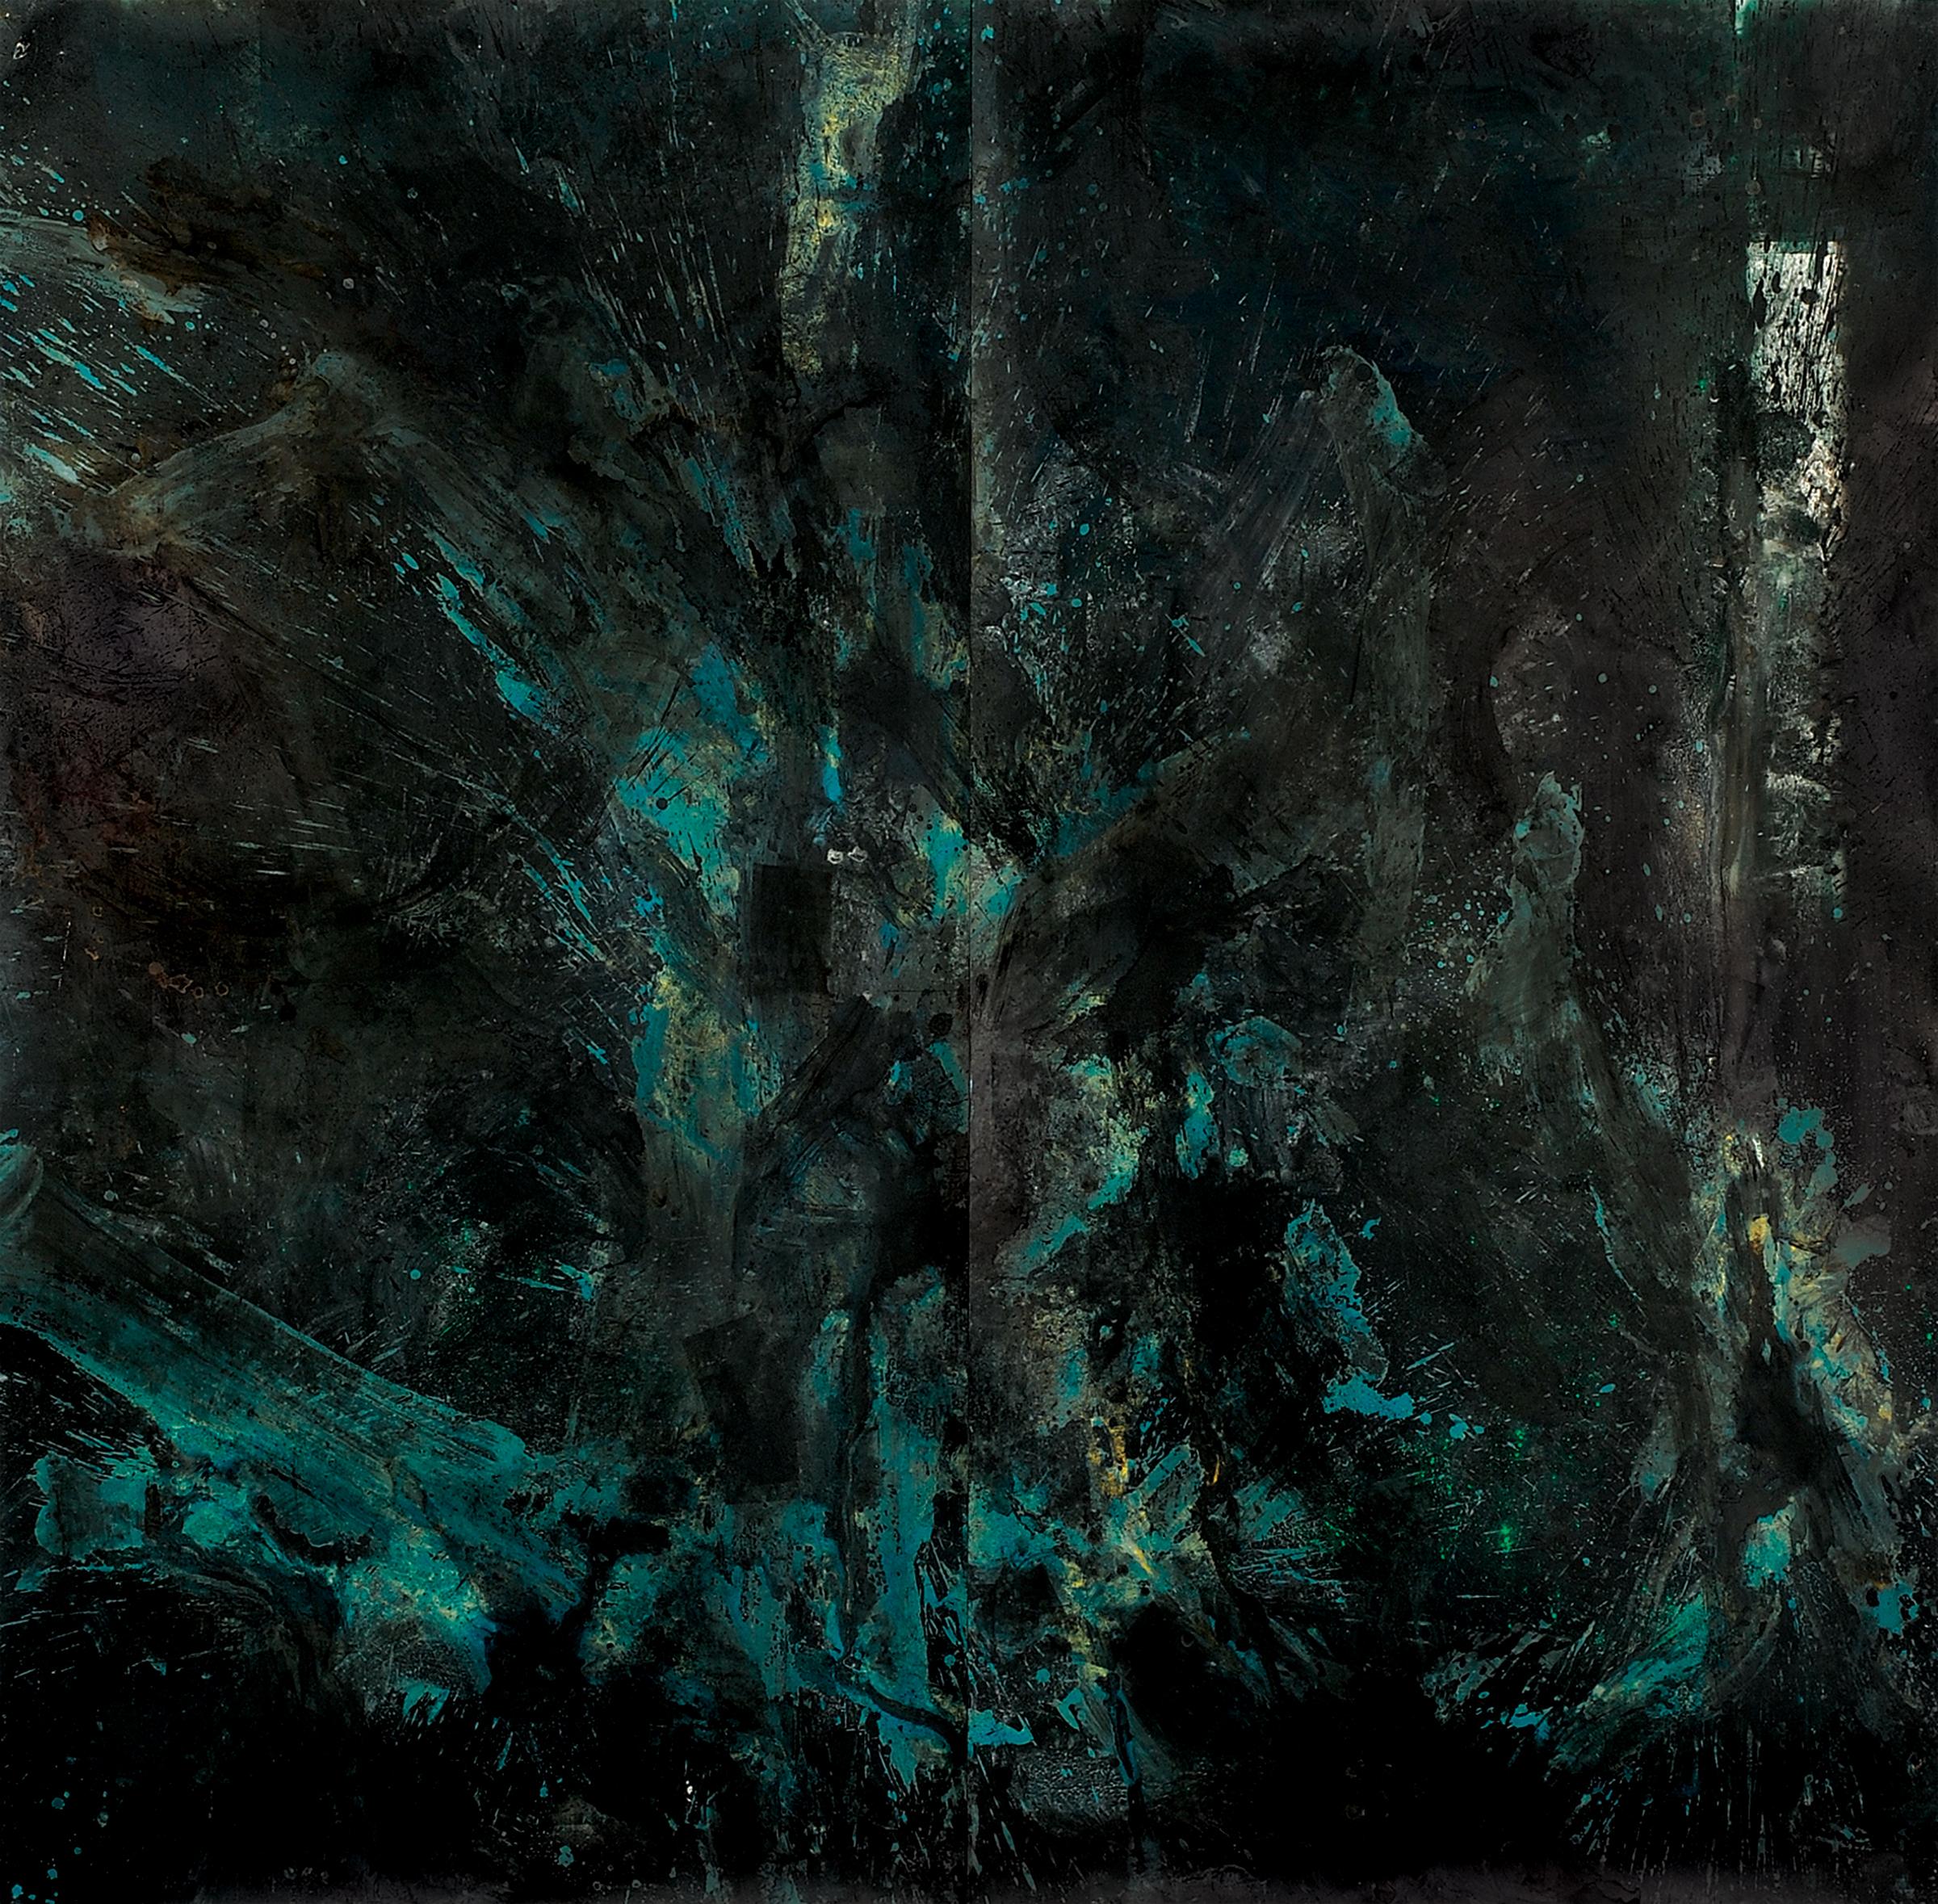 Untitled 01, 2011